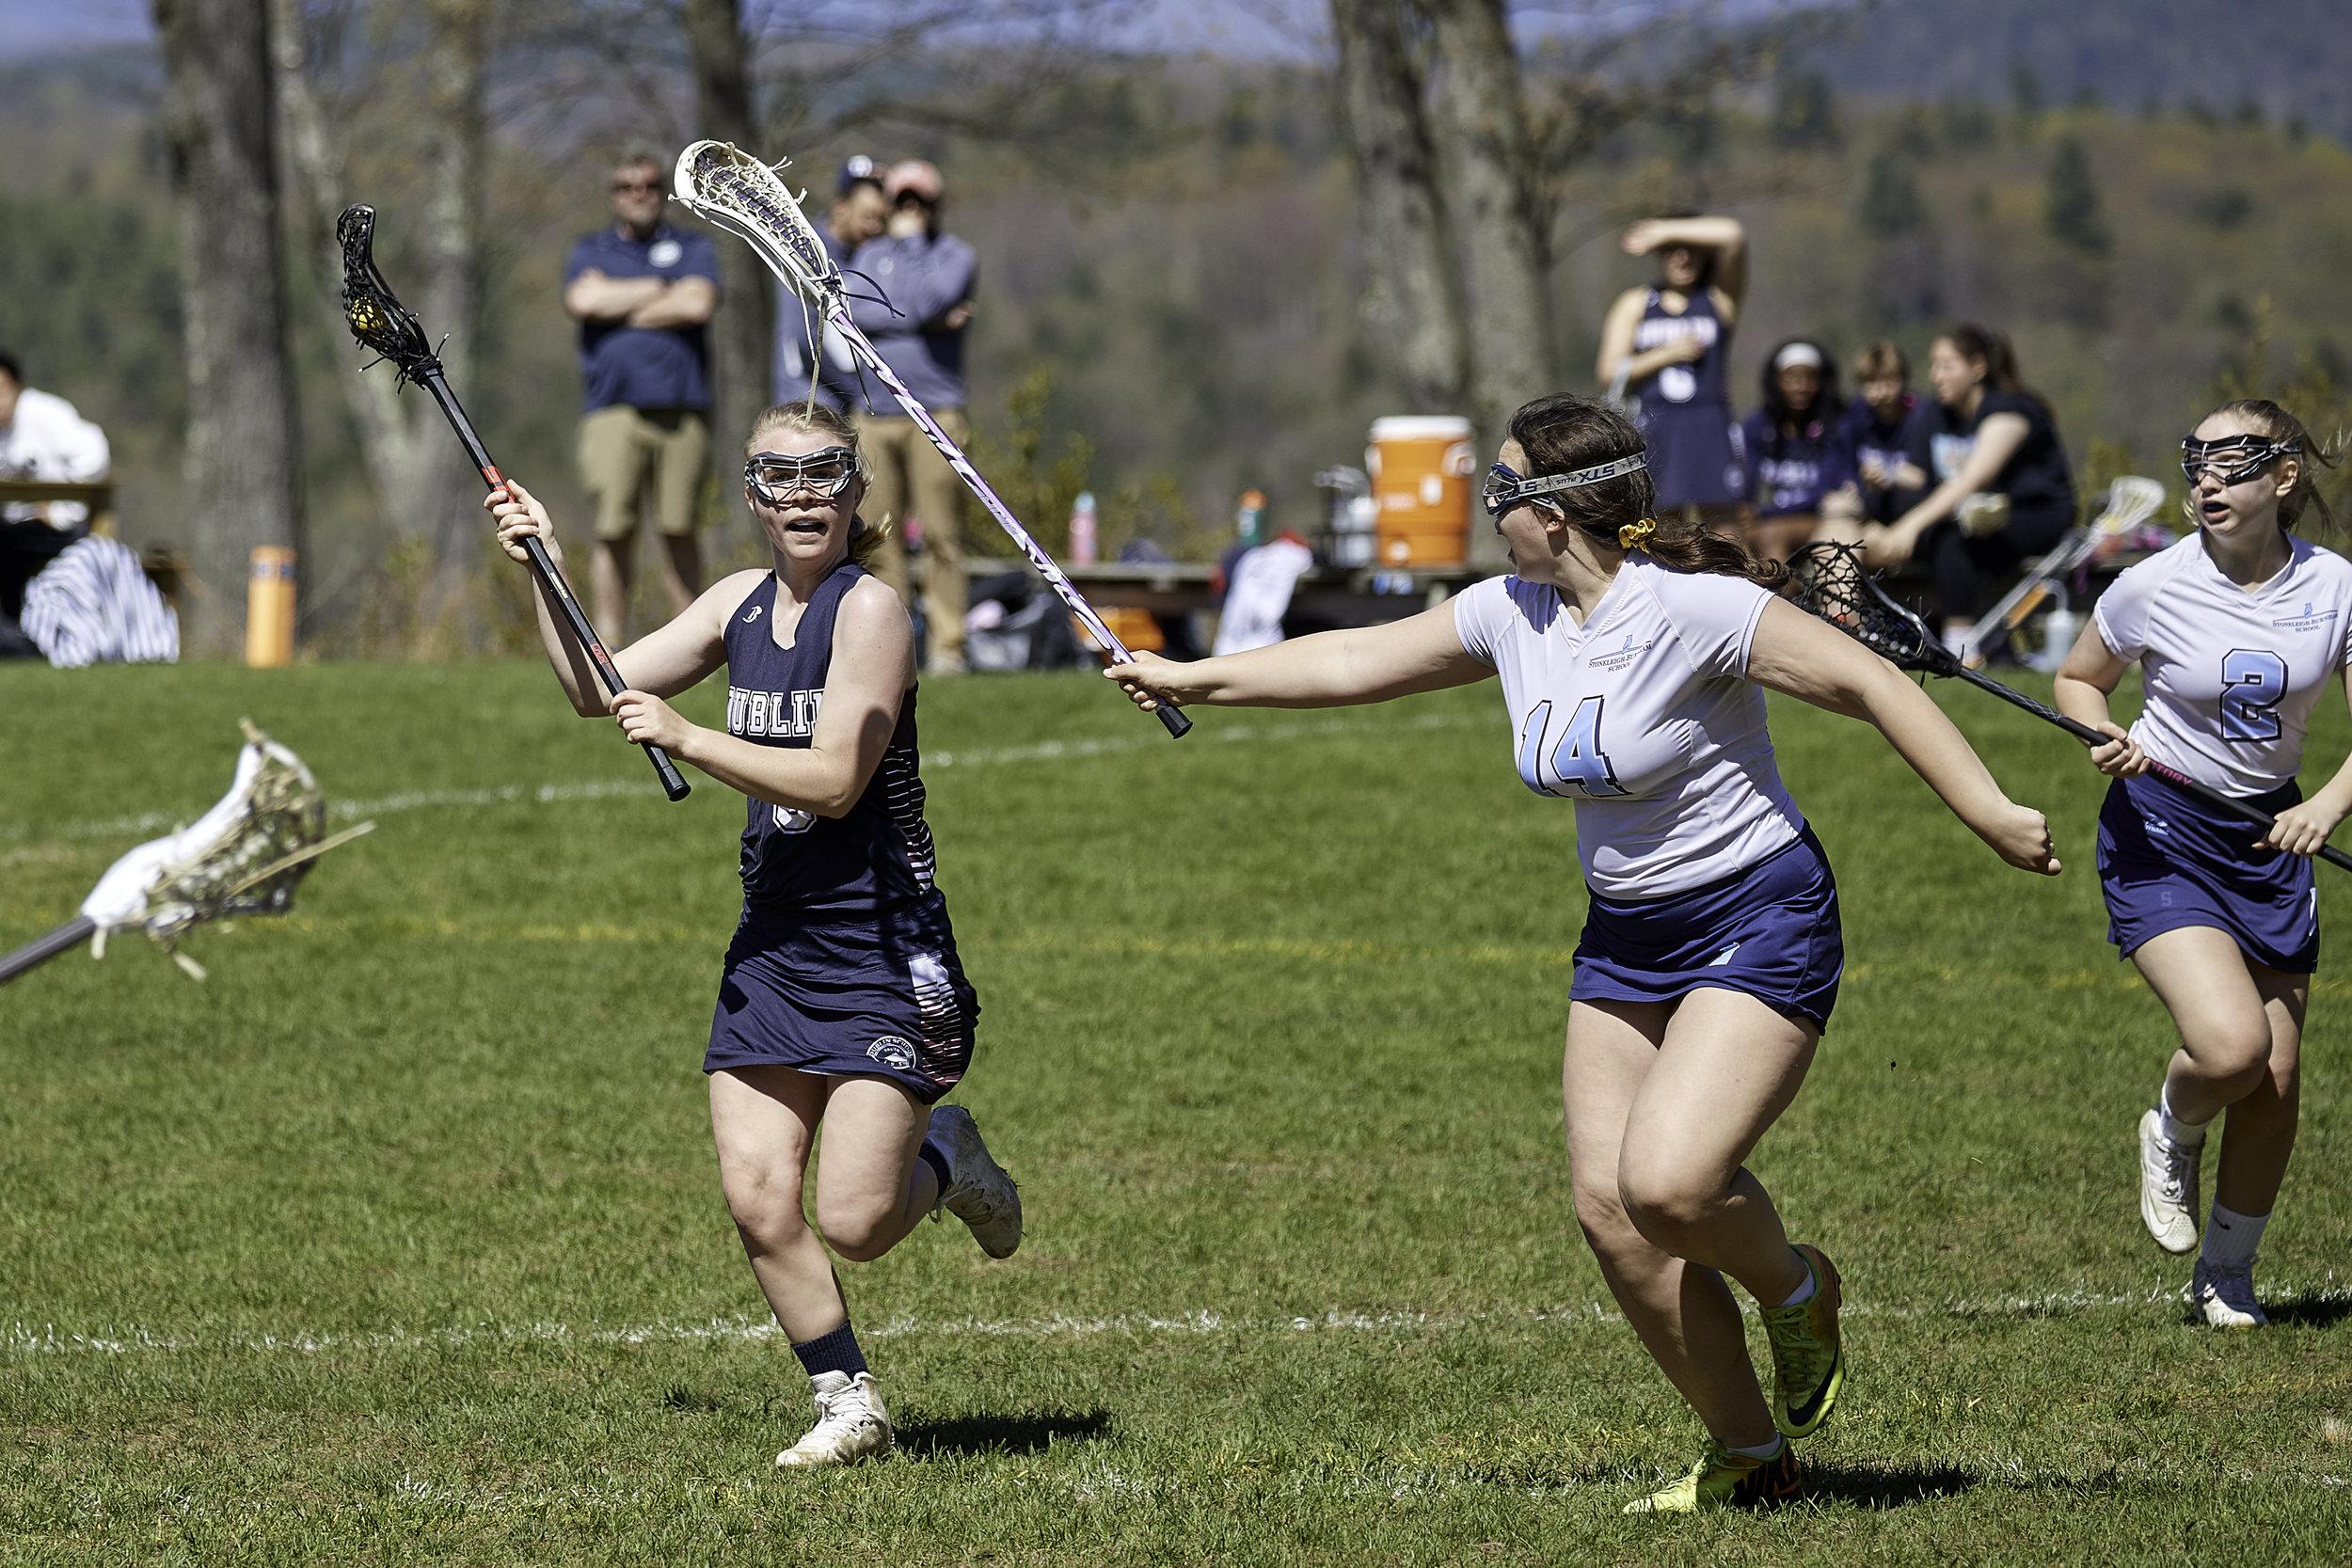 Girls Lacrosse vs. Stoneleigh Burnham School - May 11, 2019 - May 10, 2019193352.jpg